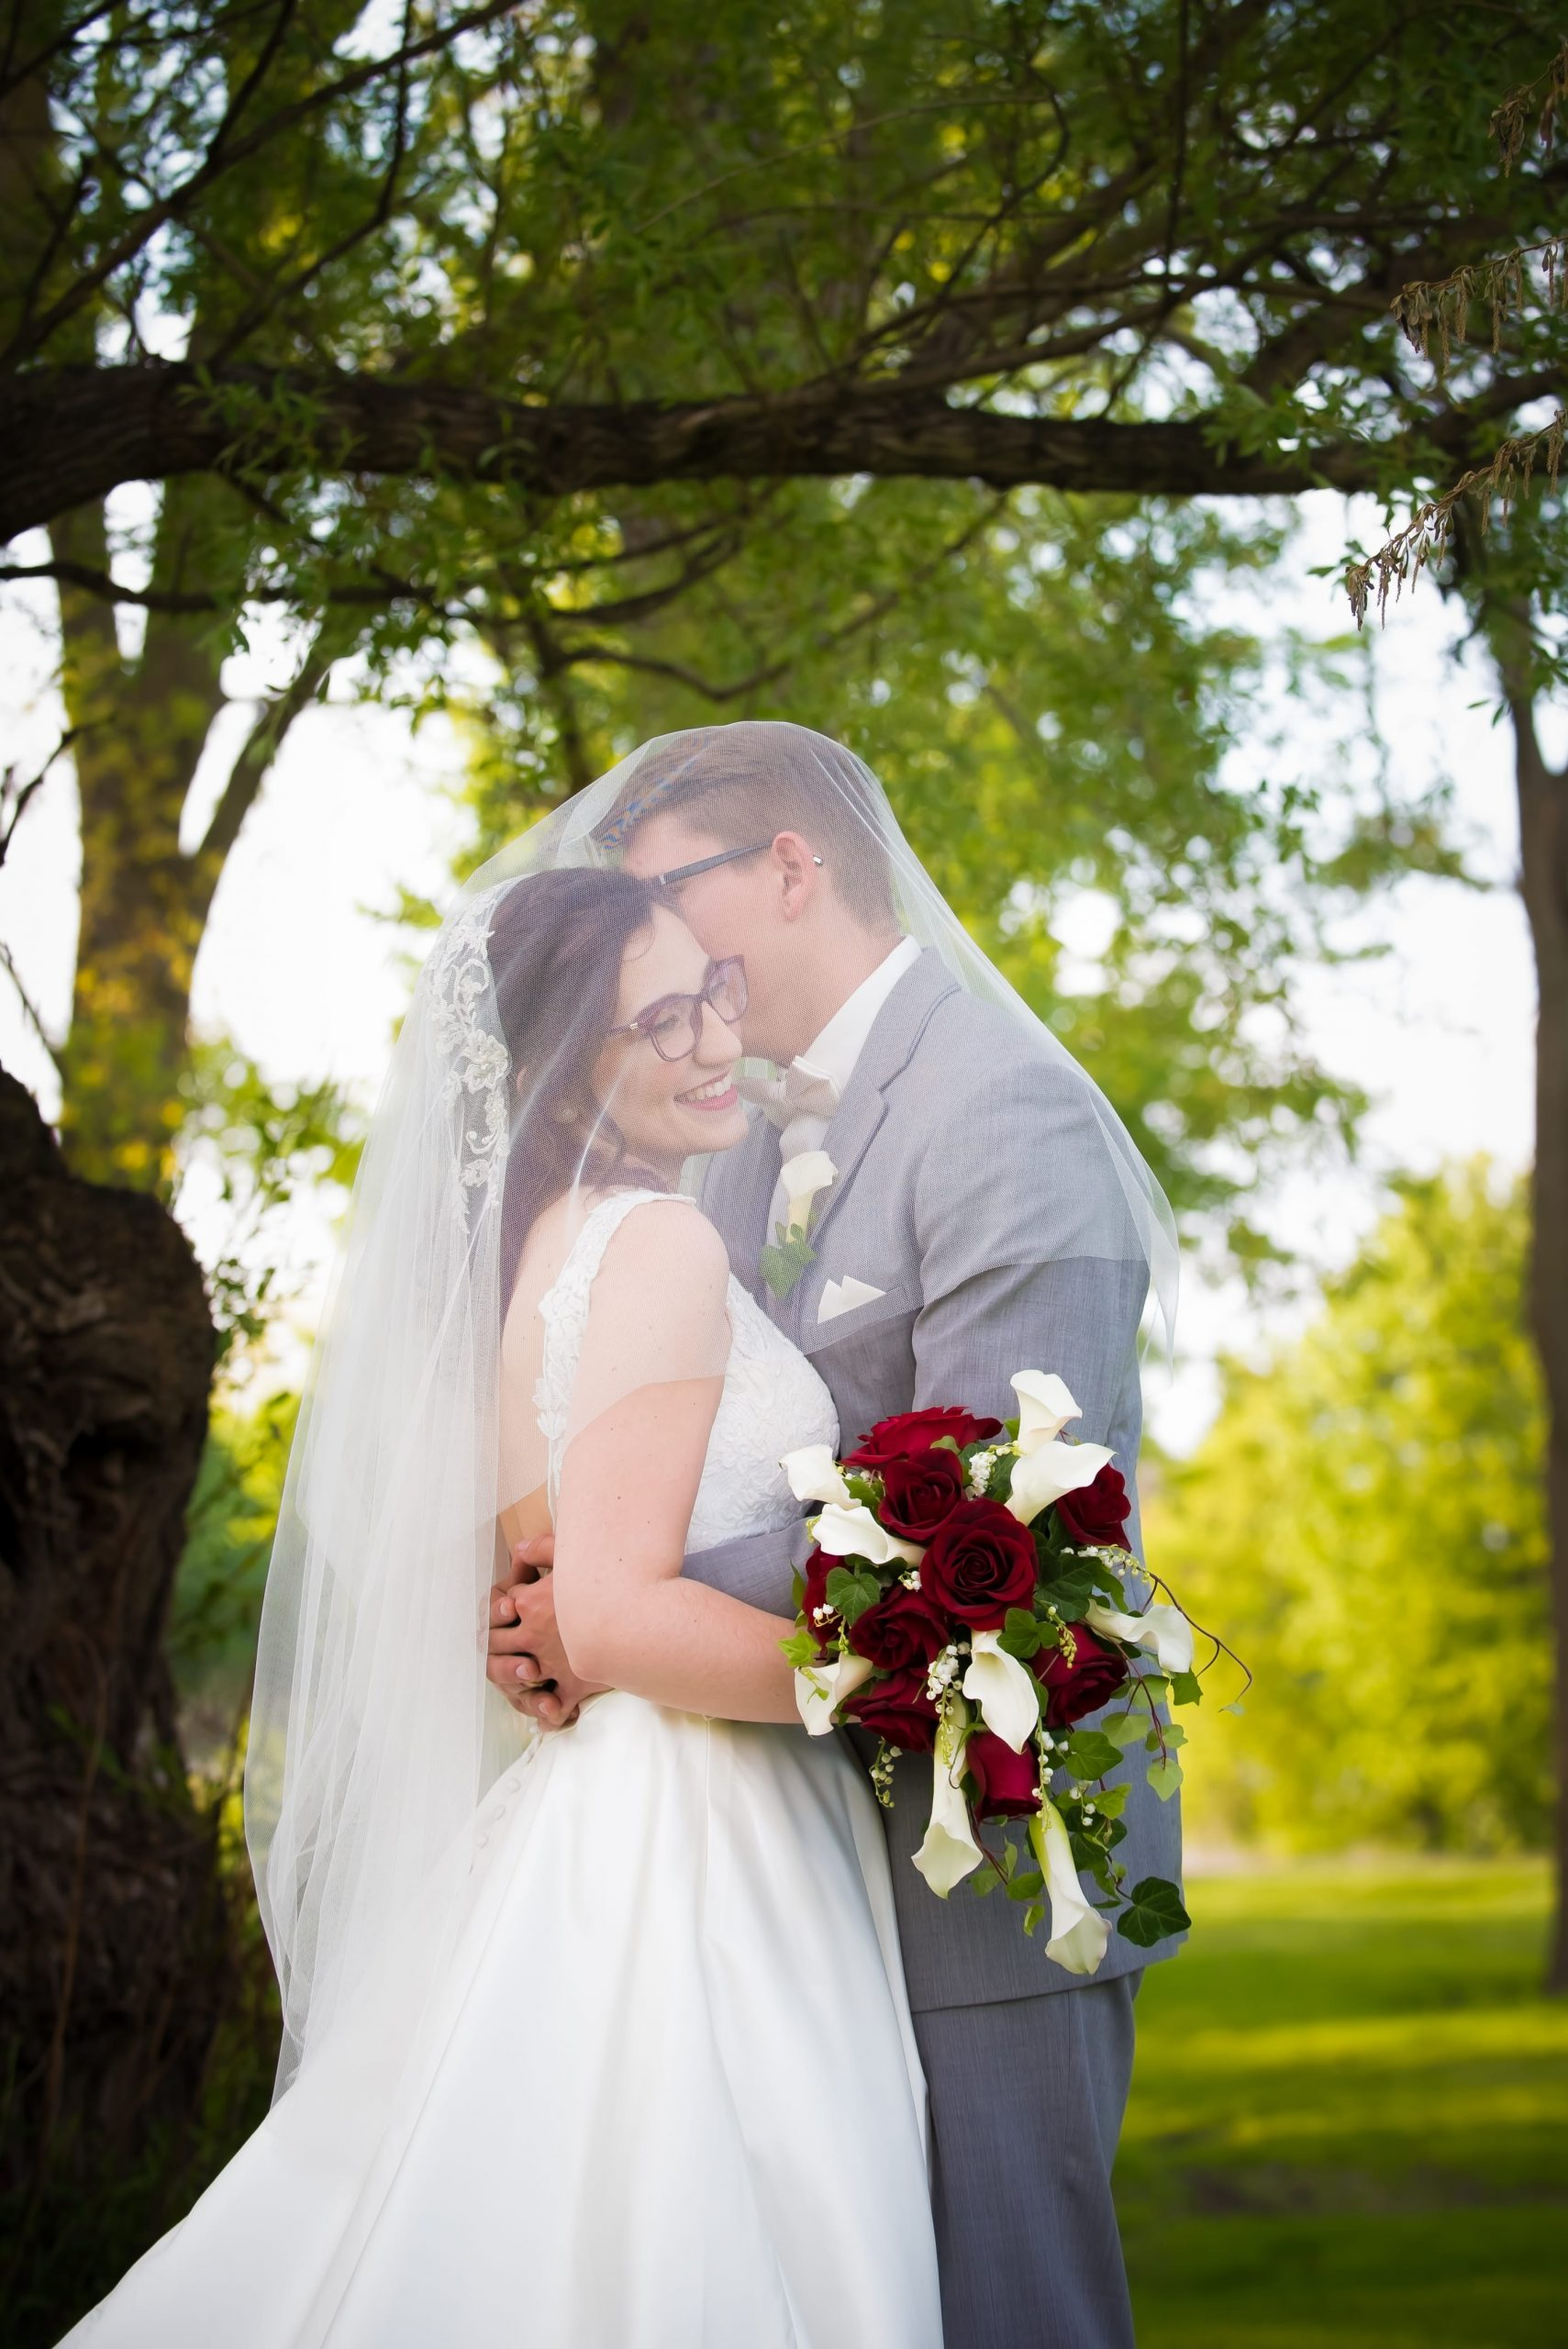 bride and groom wedding photo